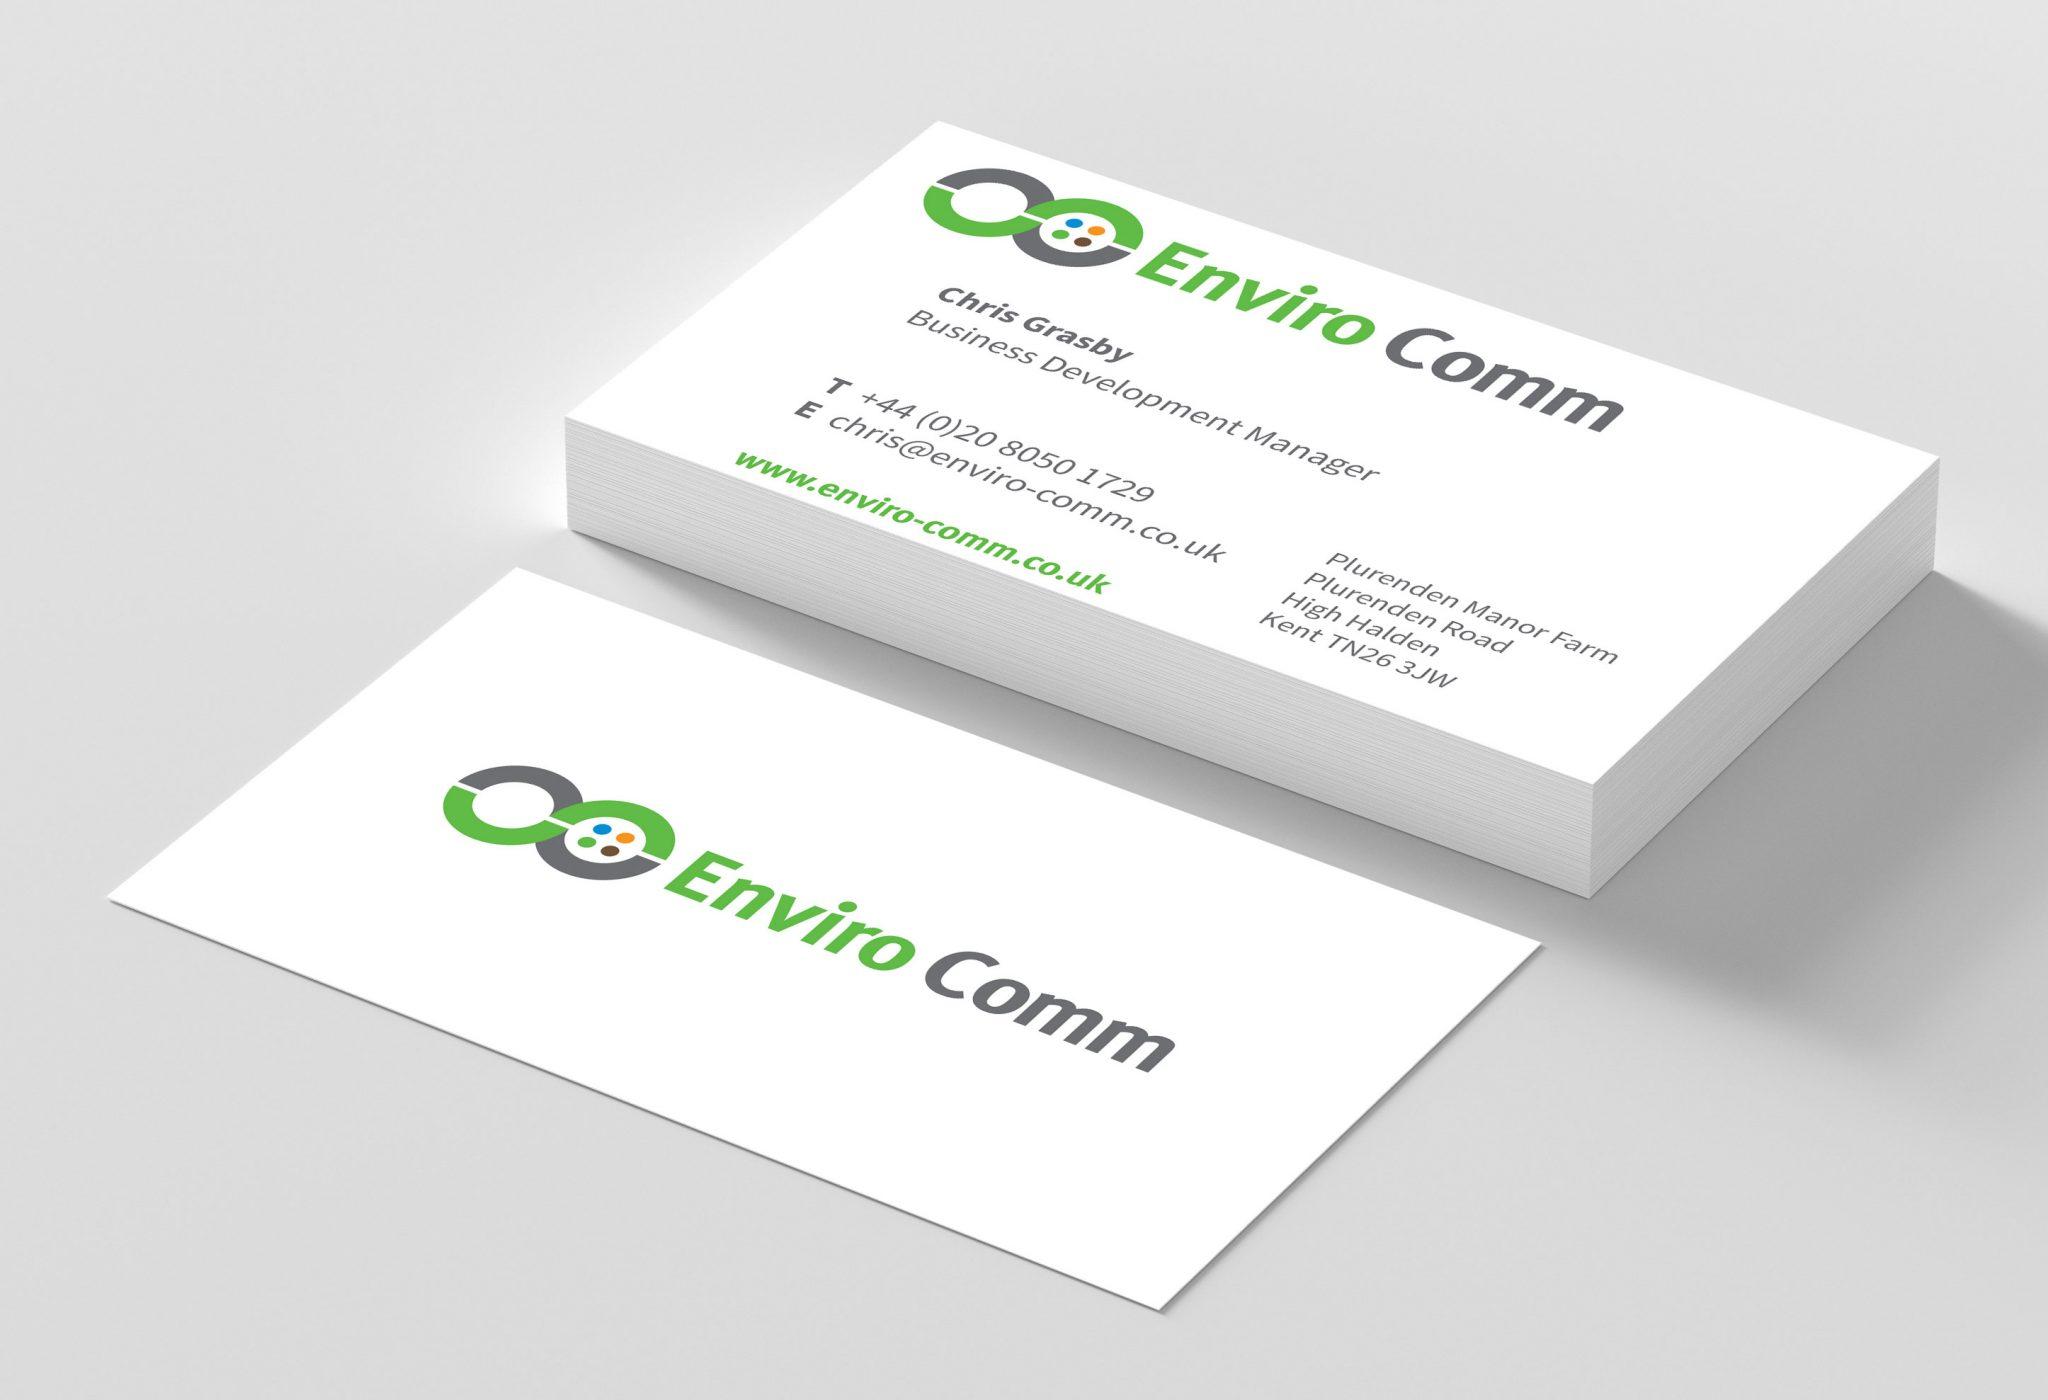 Enviro Comm - business card design